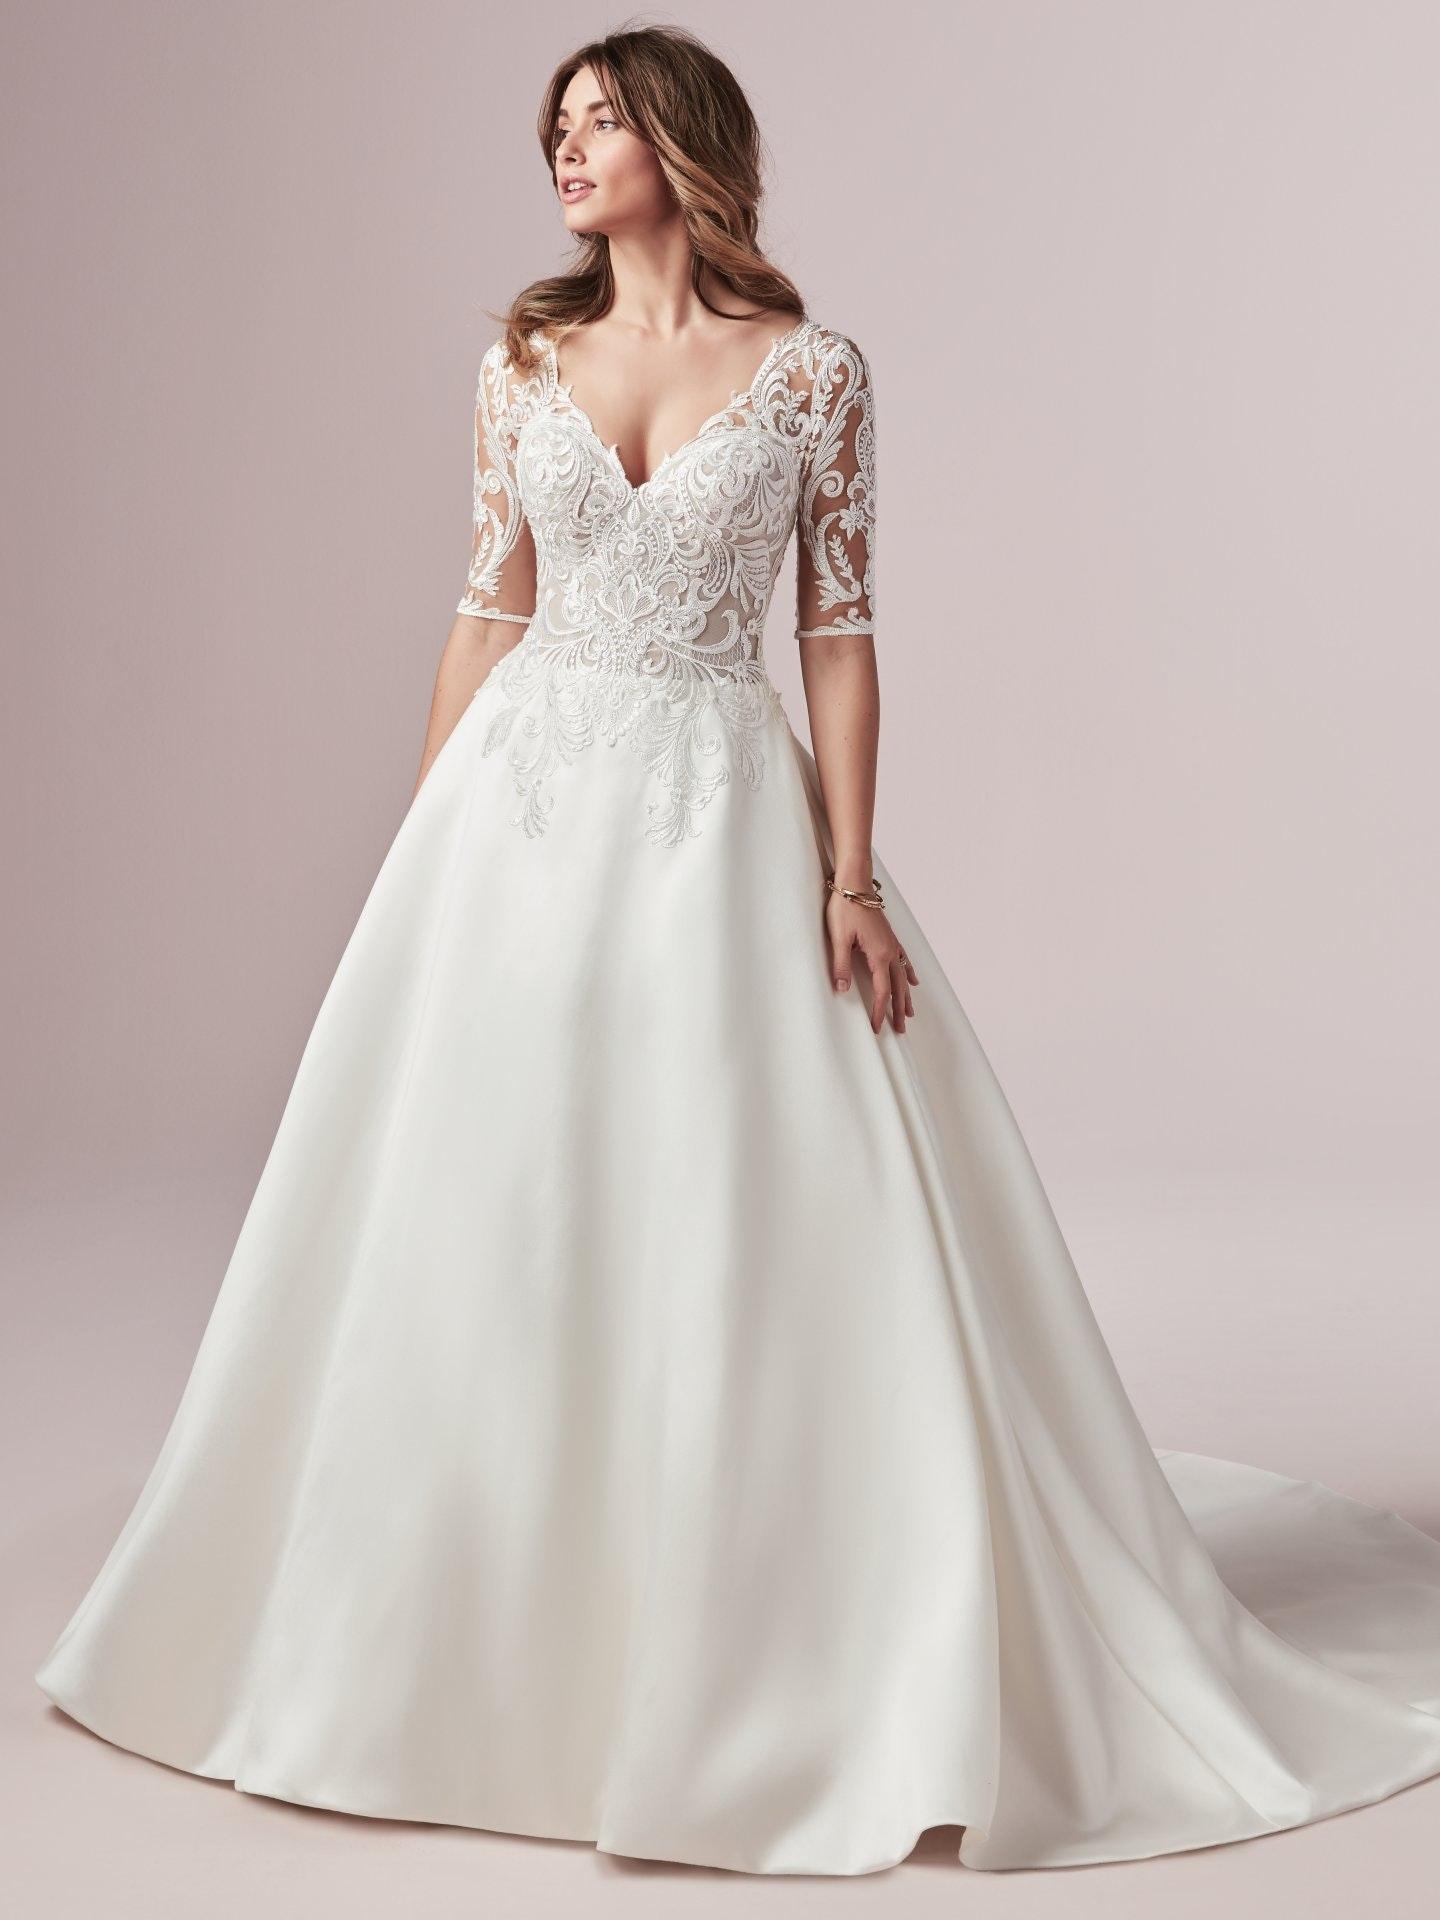 Spencer Wedding Dress